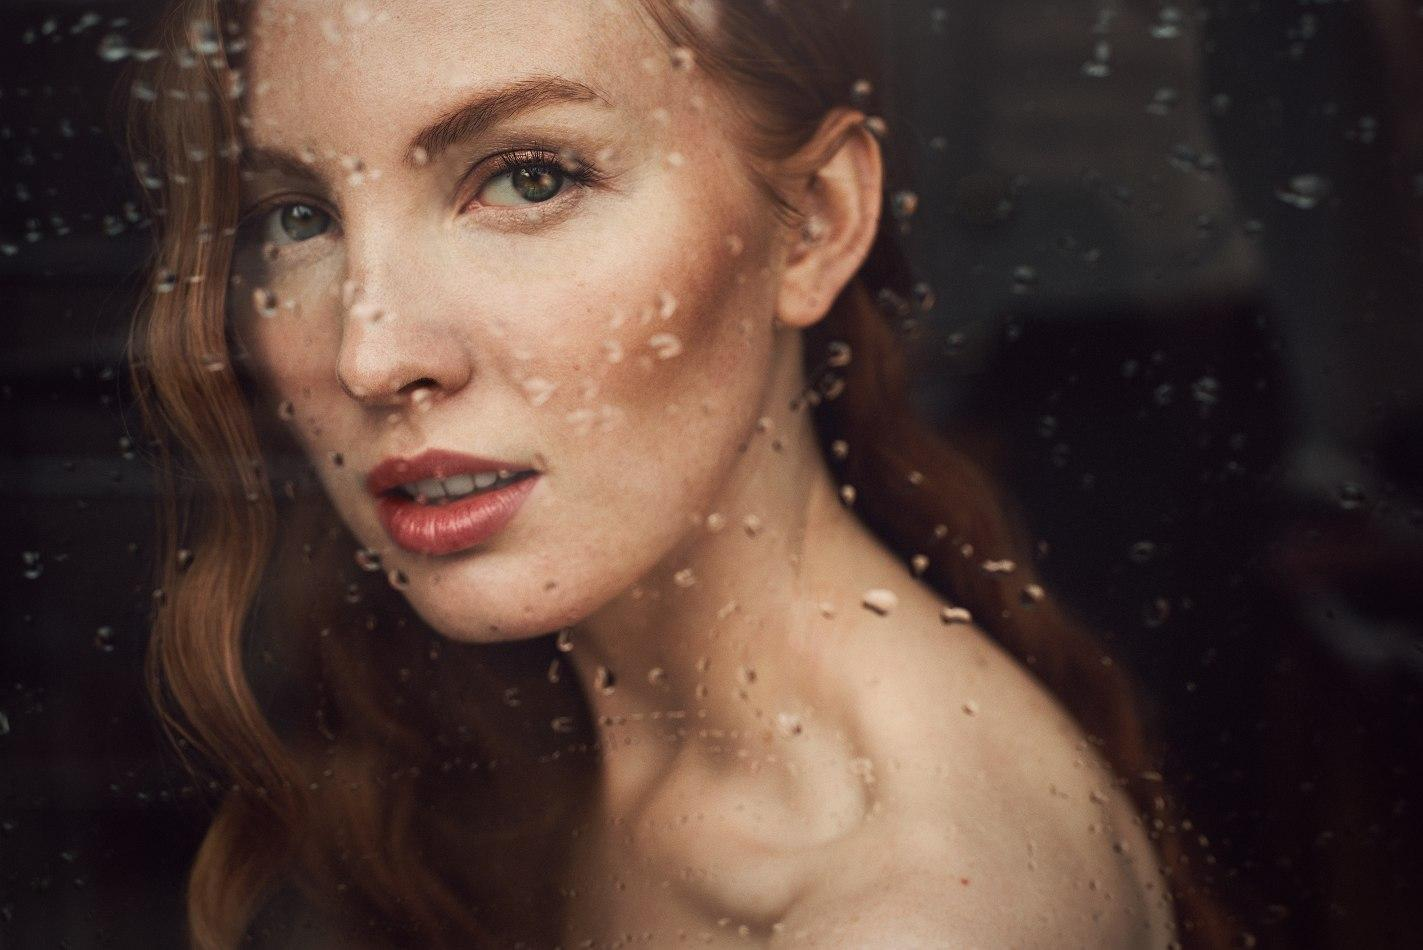 VALERIA LEONOVA